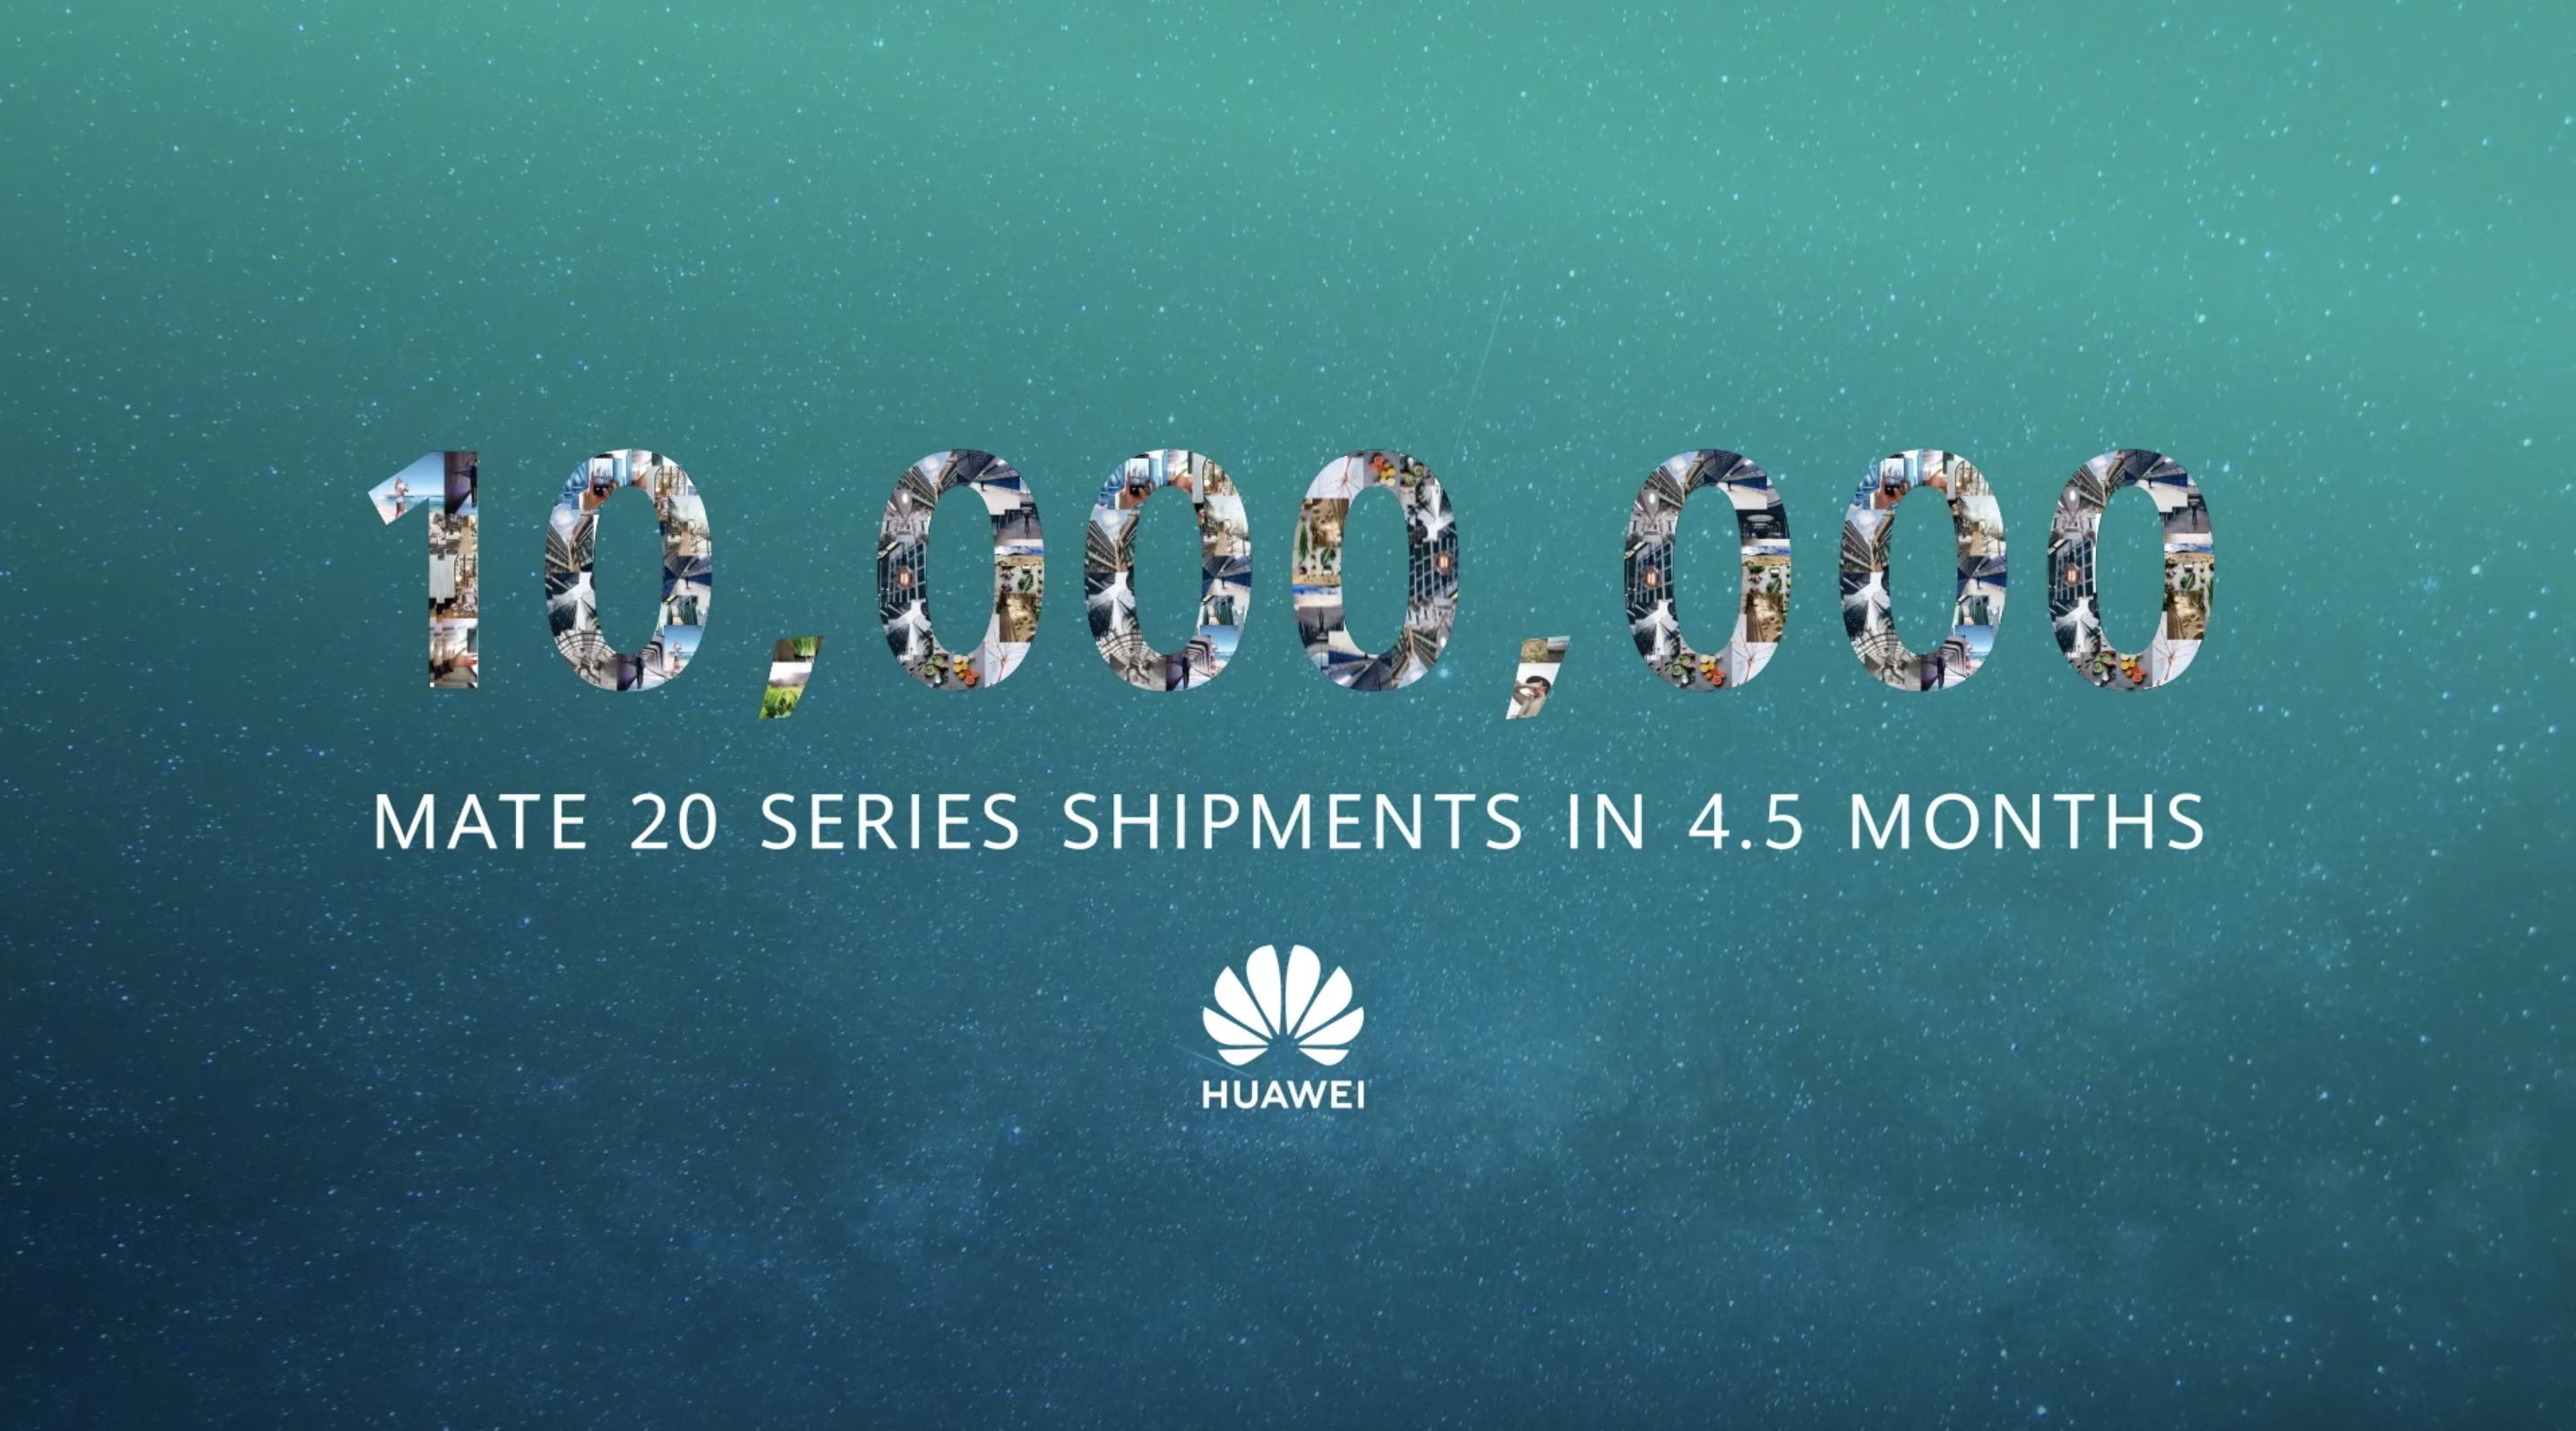 شحنات سلسلة هواتف HUAWEI Mate 20 تتخطى الـ 10 مليون وحدة